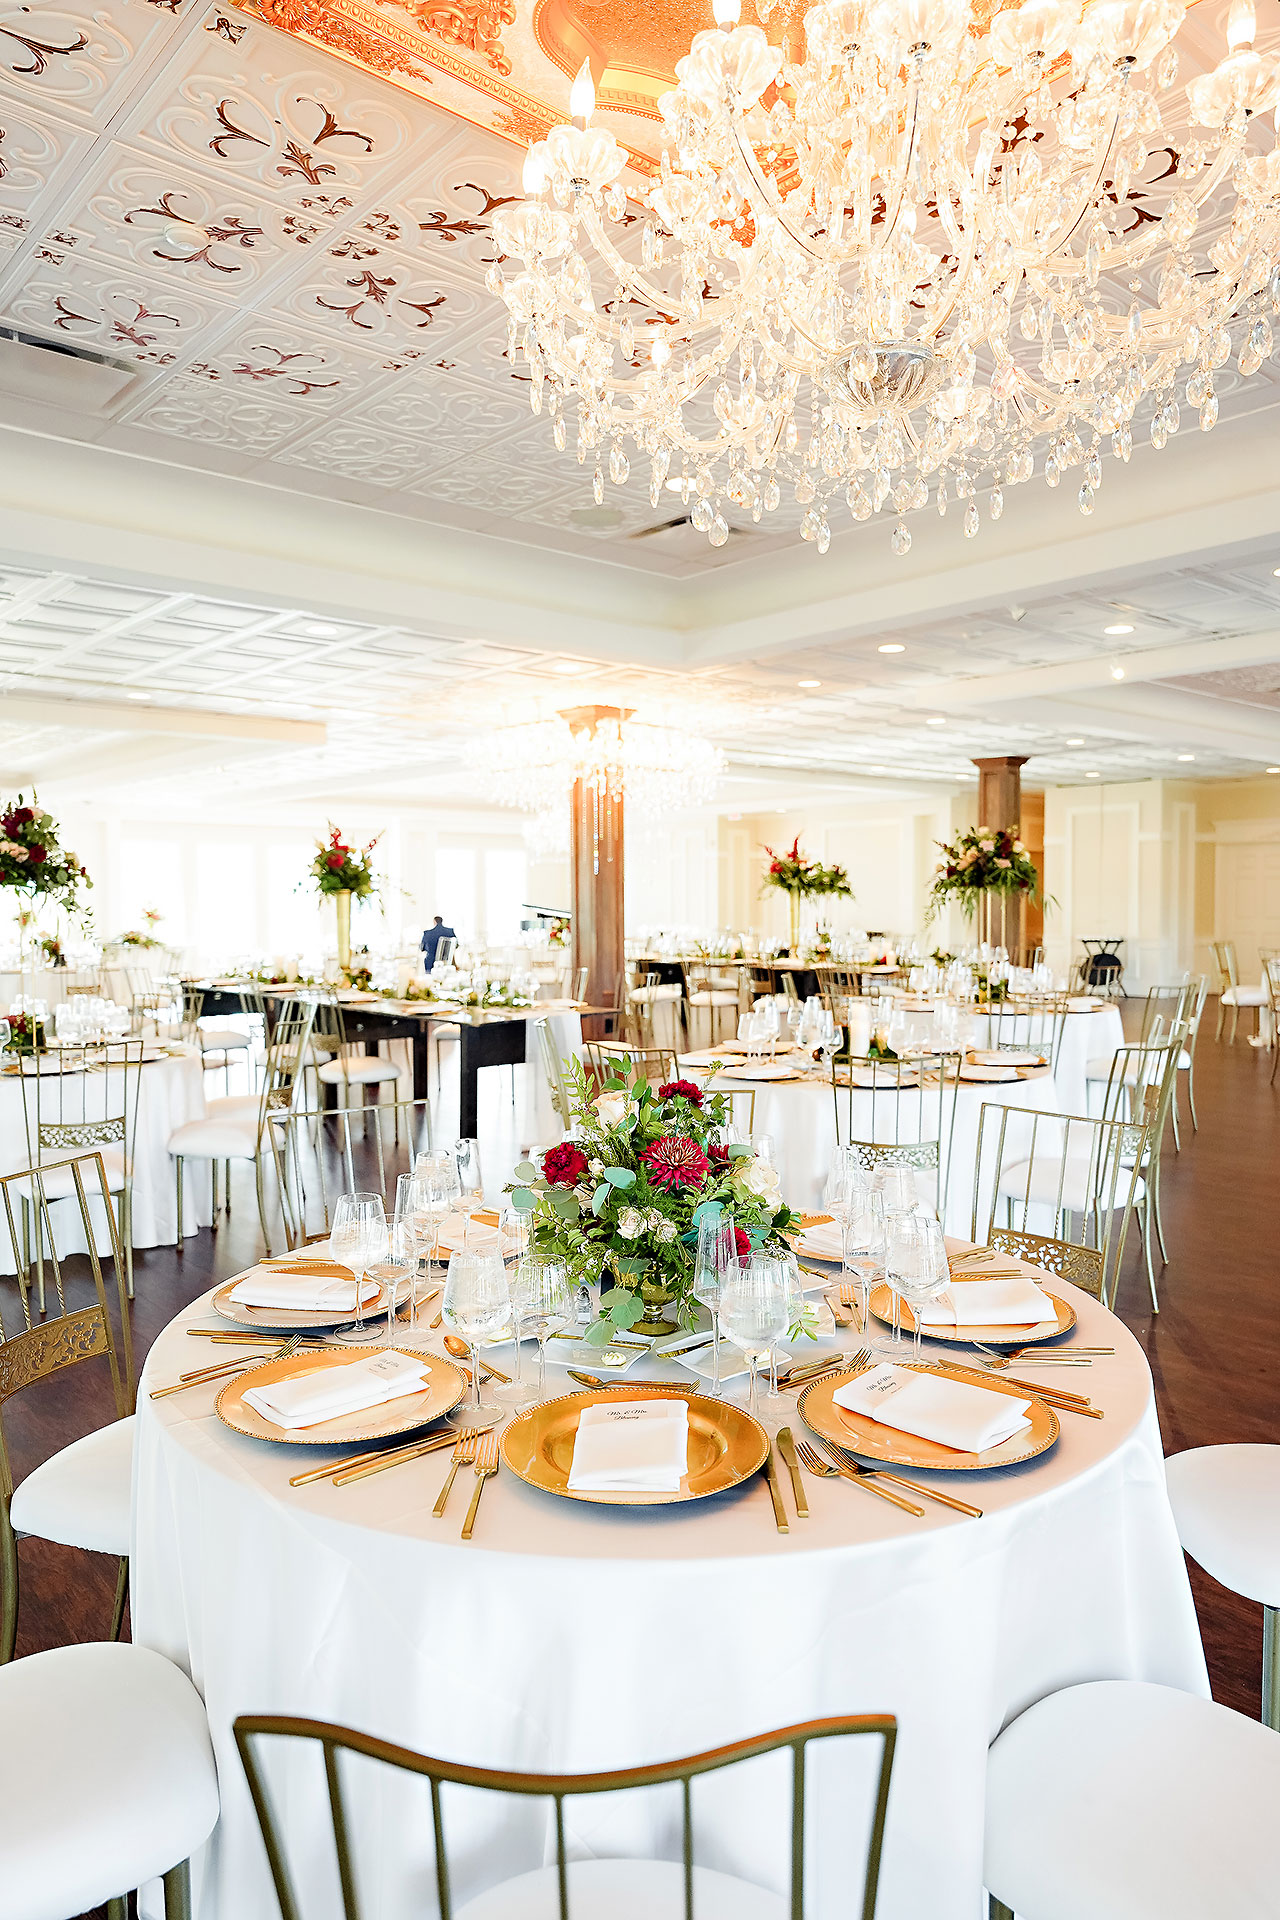 Nadia Parker Black Iris Estate Carmel Indiana Wedding May 2021 230